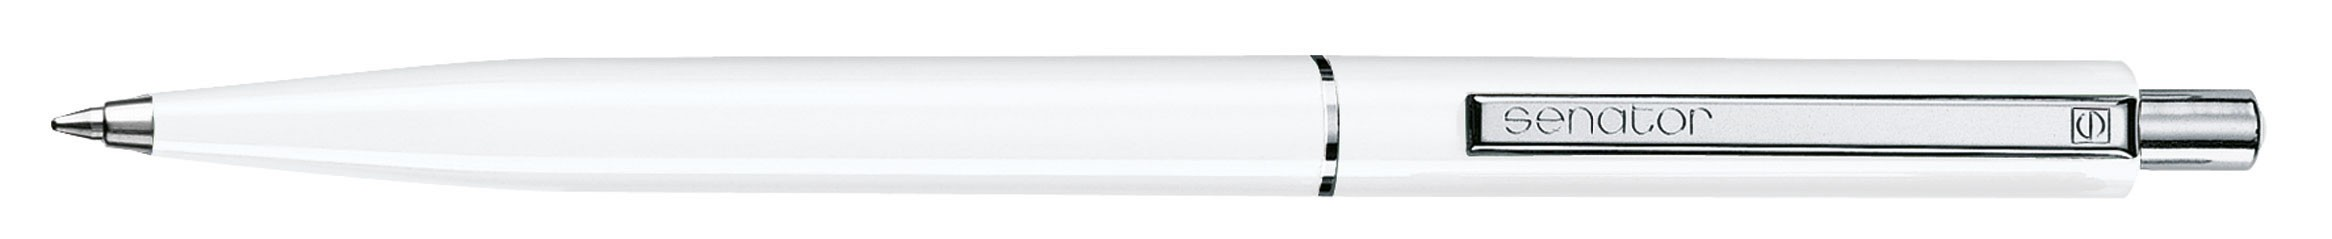 Stylo personnalisable écologique Point Polished - stylo promotionnel